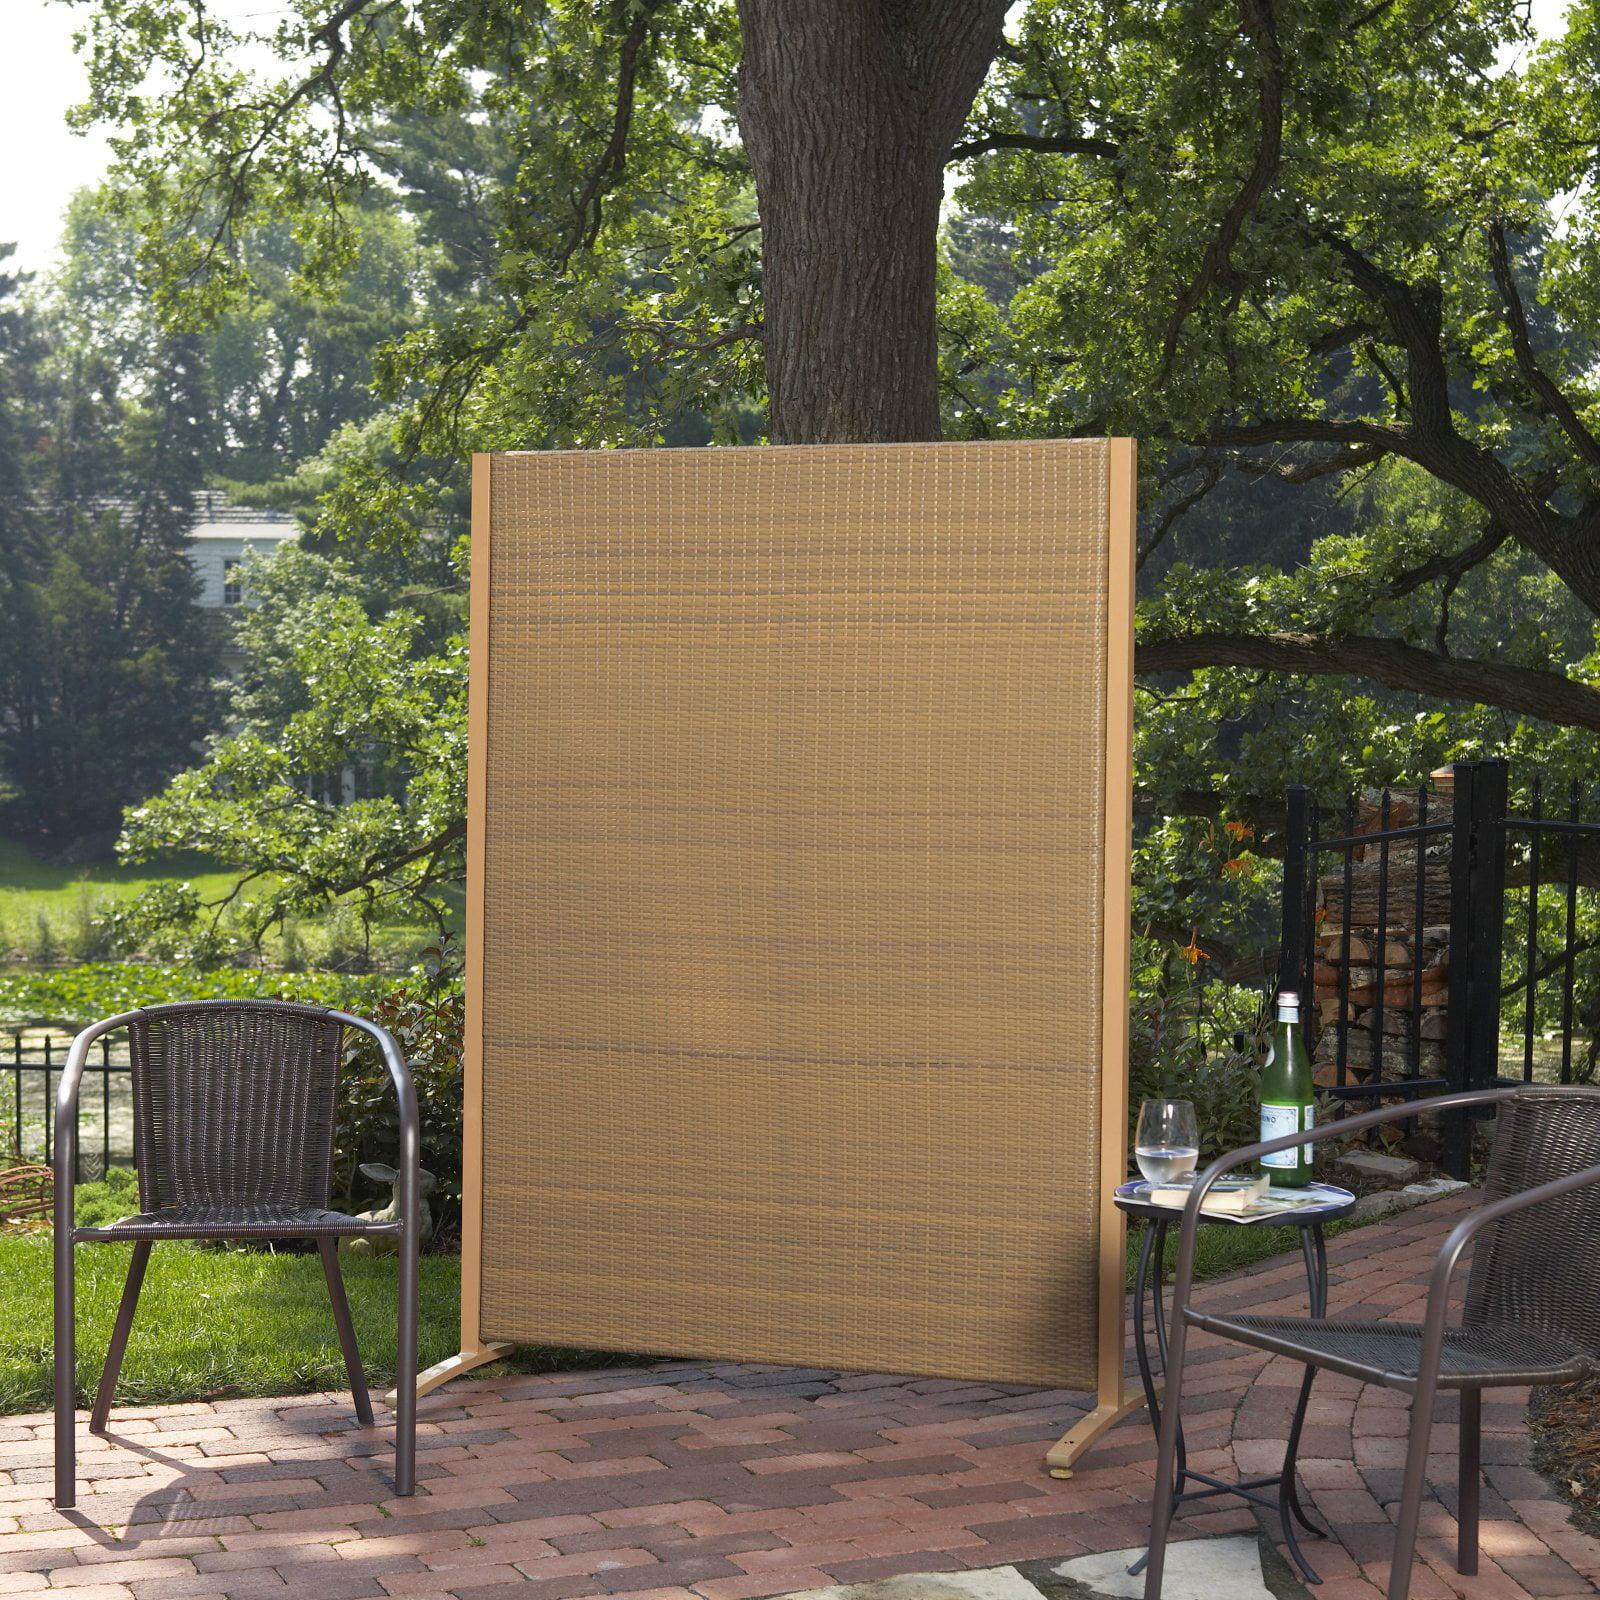 Versare Outdoor Wicker Resin Room Divider